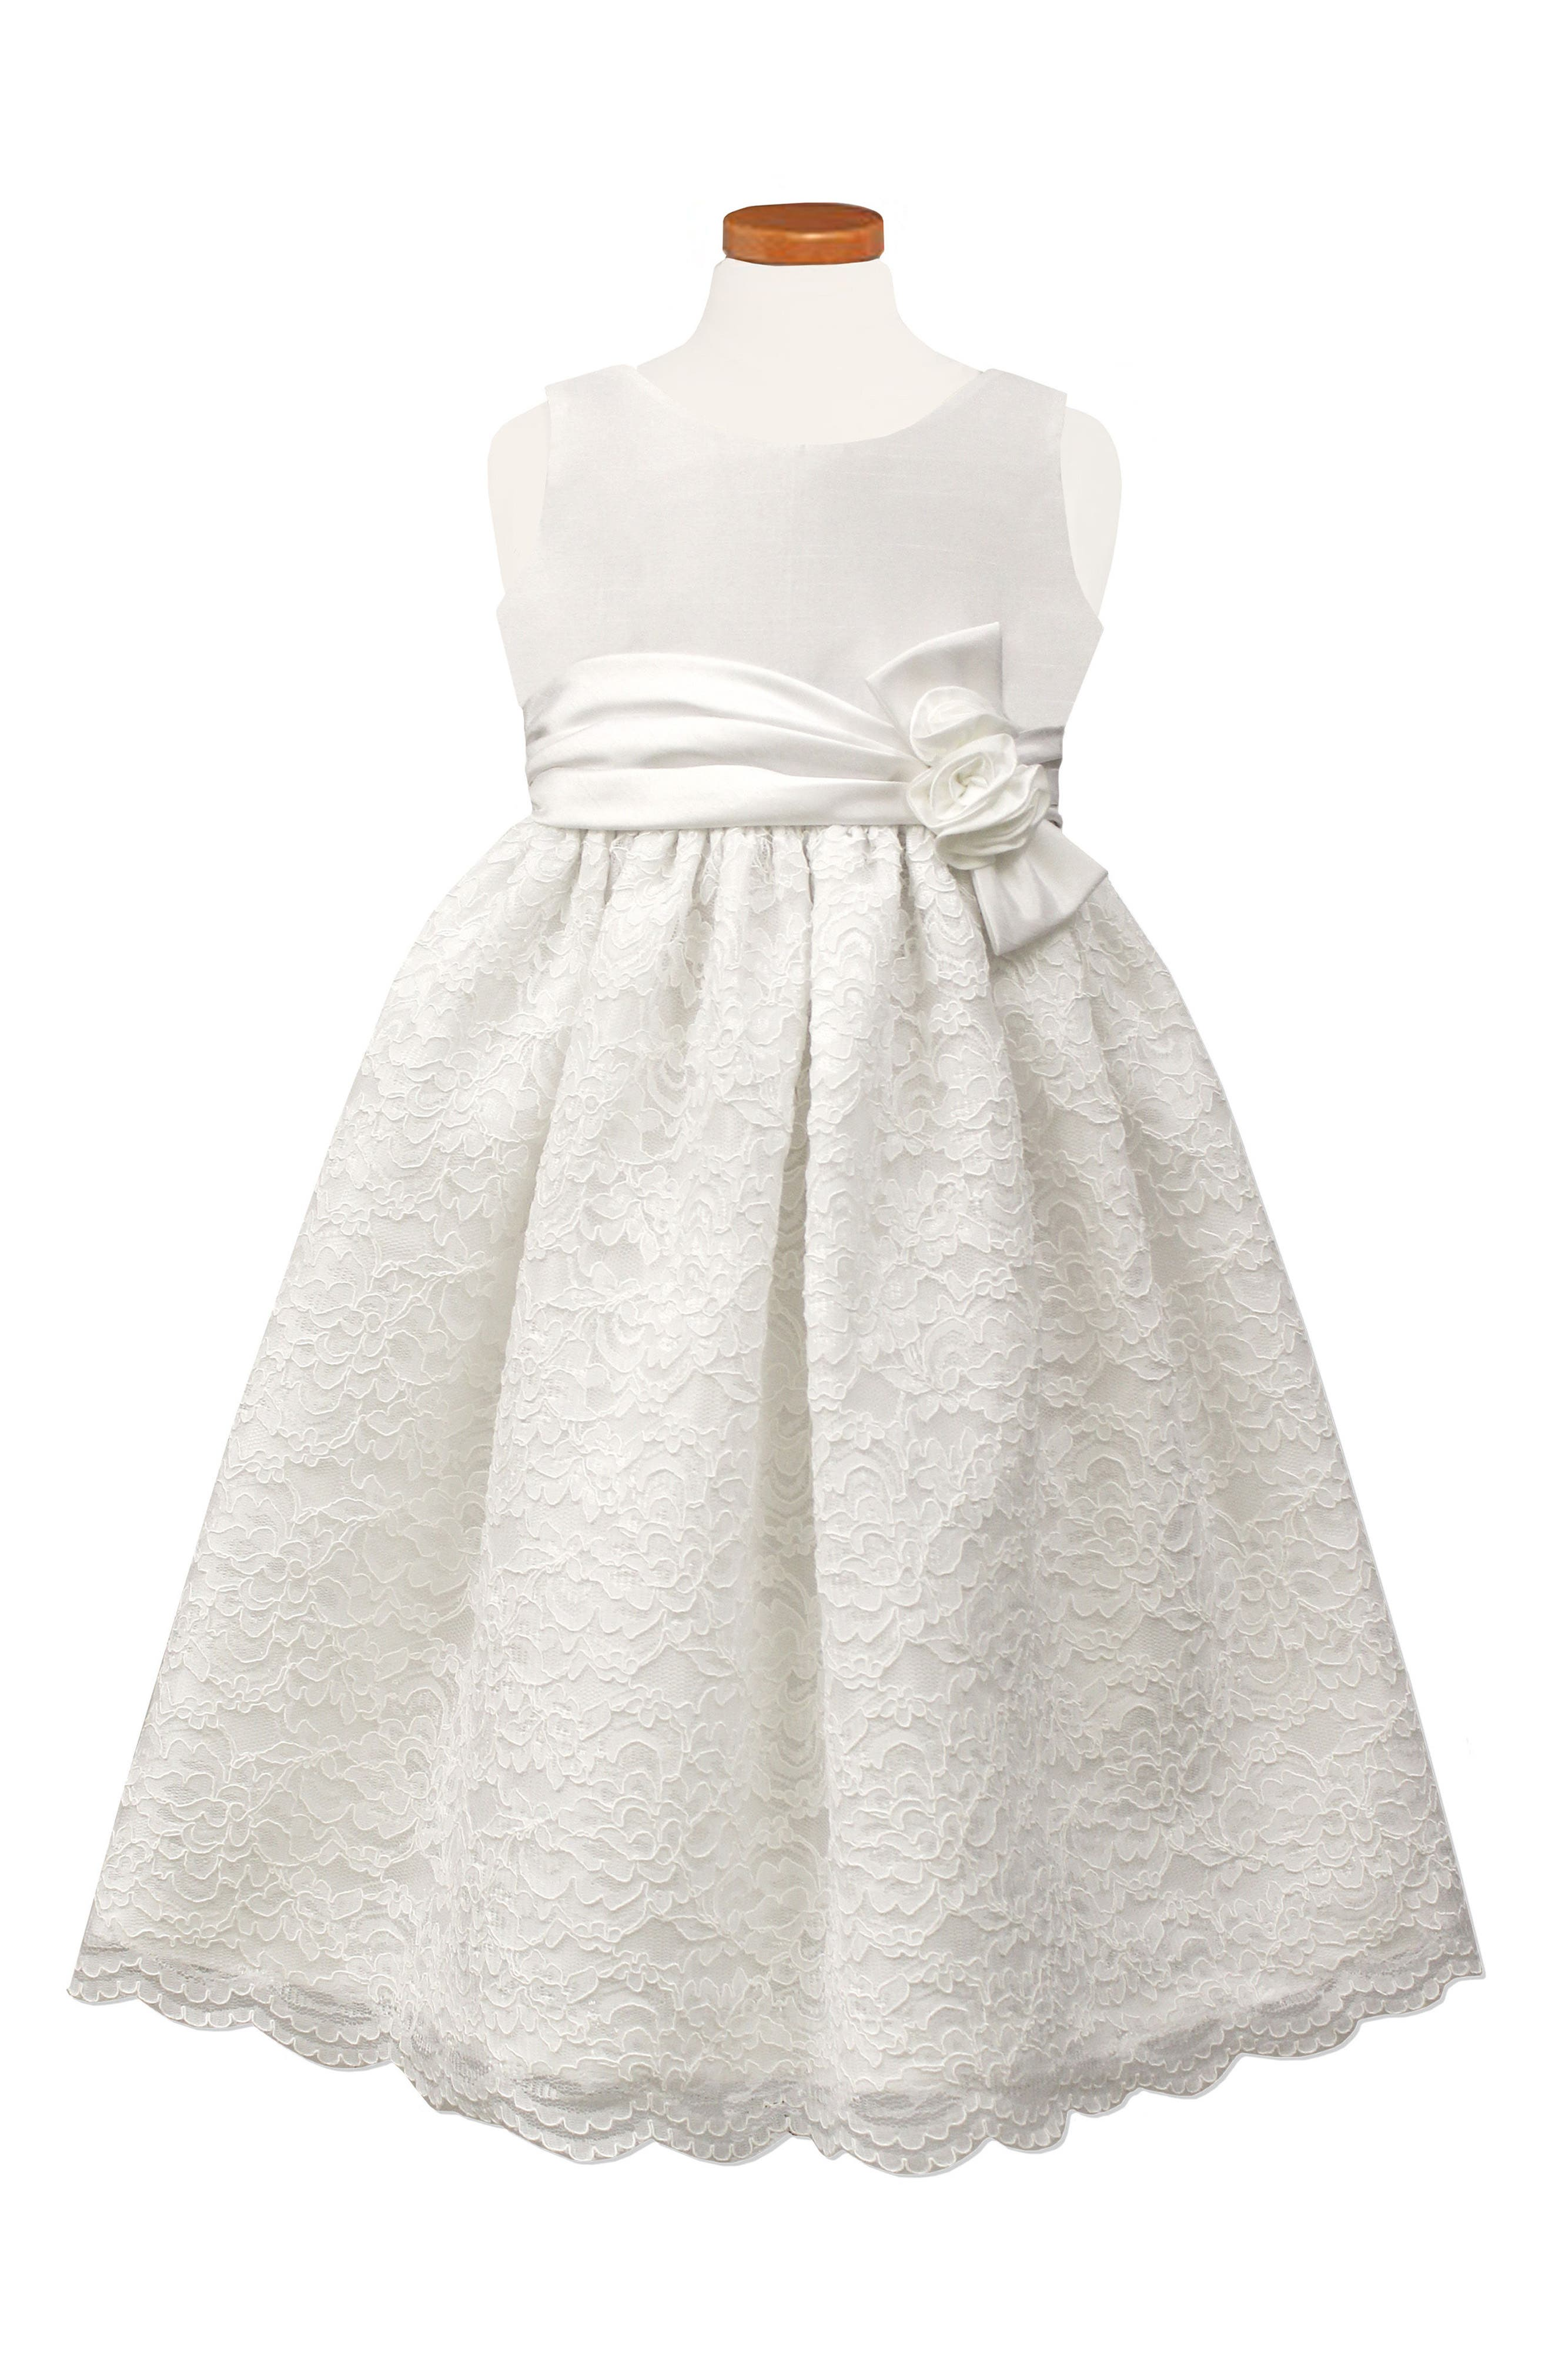 Main Image - Sorbet Satin & Lace Party Dress (Big Girls)